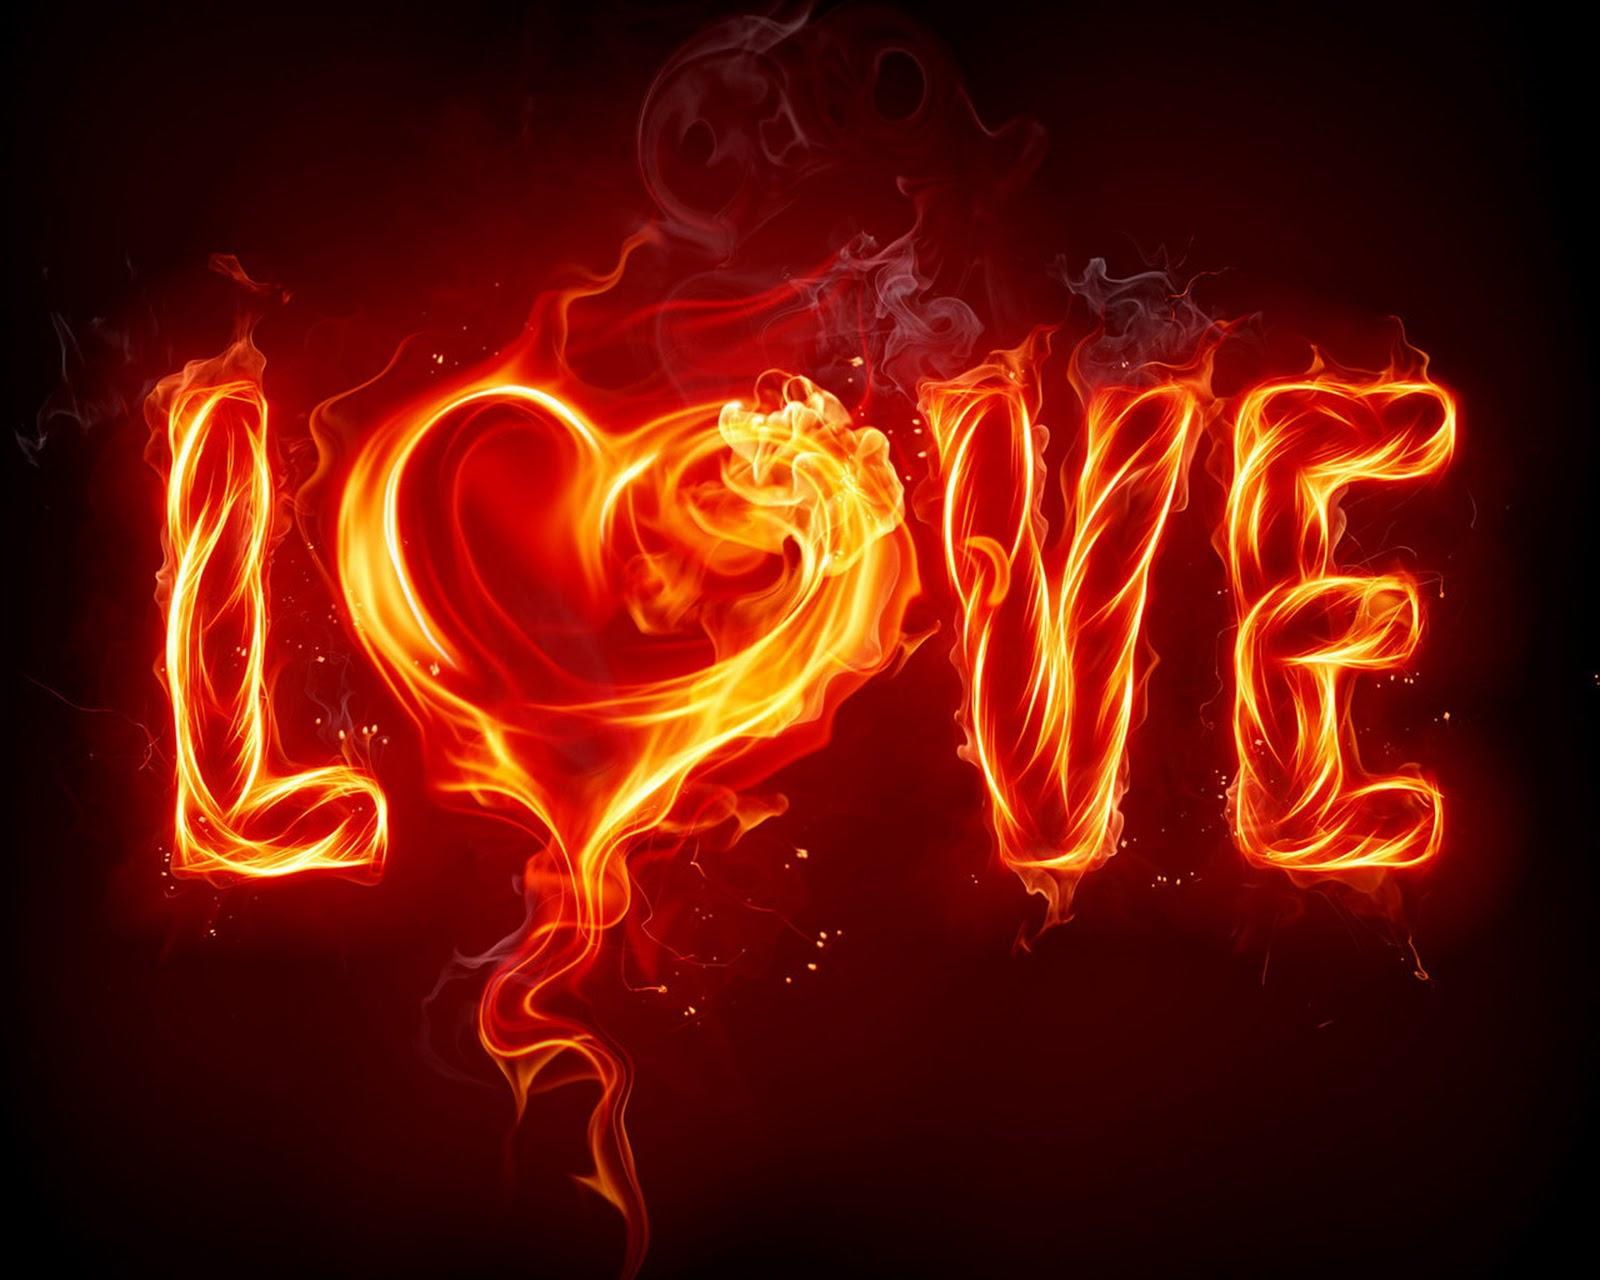 http://4.bp.blogspot.com/-0Rh4Lu05kso/T63jekXgmKI/AAAAAAAABy0/uhVv_IOh4Vg/s1600/Love_Fogo_mega_wallpapers_hd.blogspot+(11).jpg